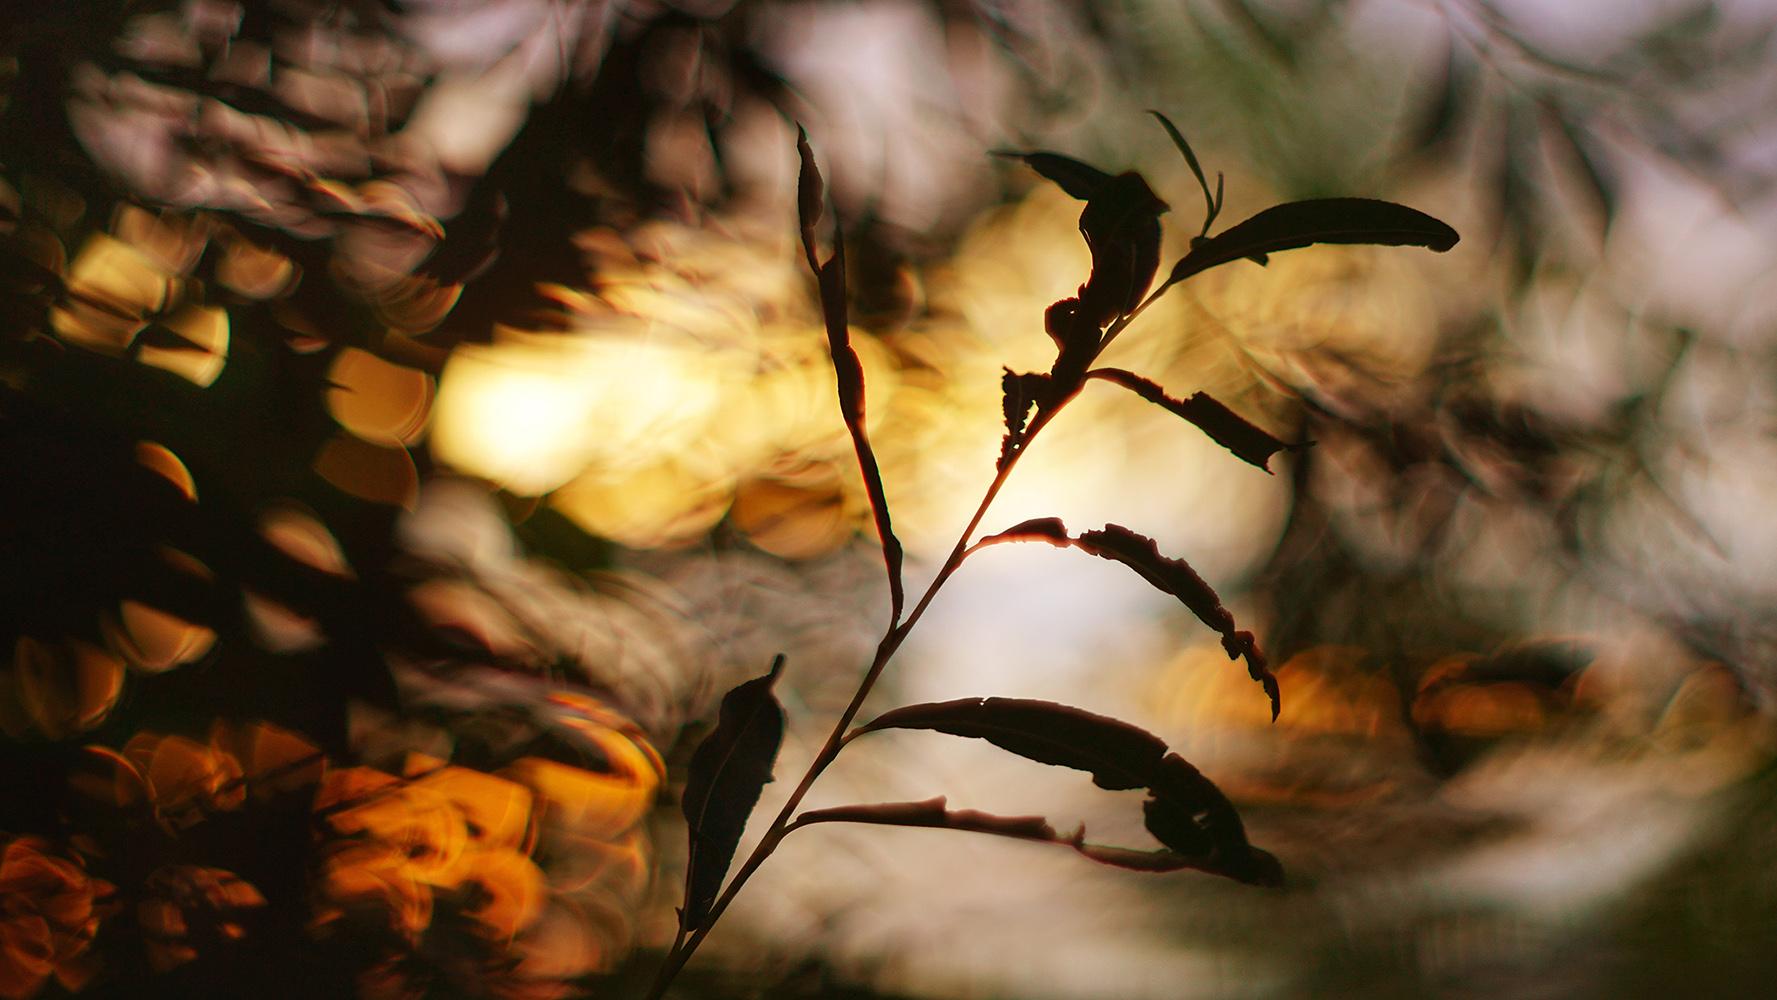 photo filler by cawtama